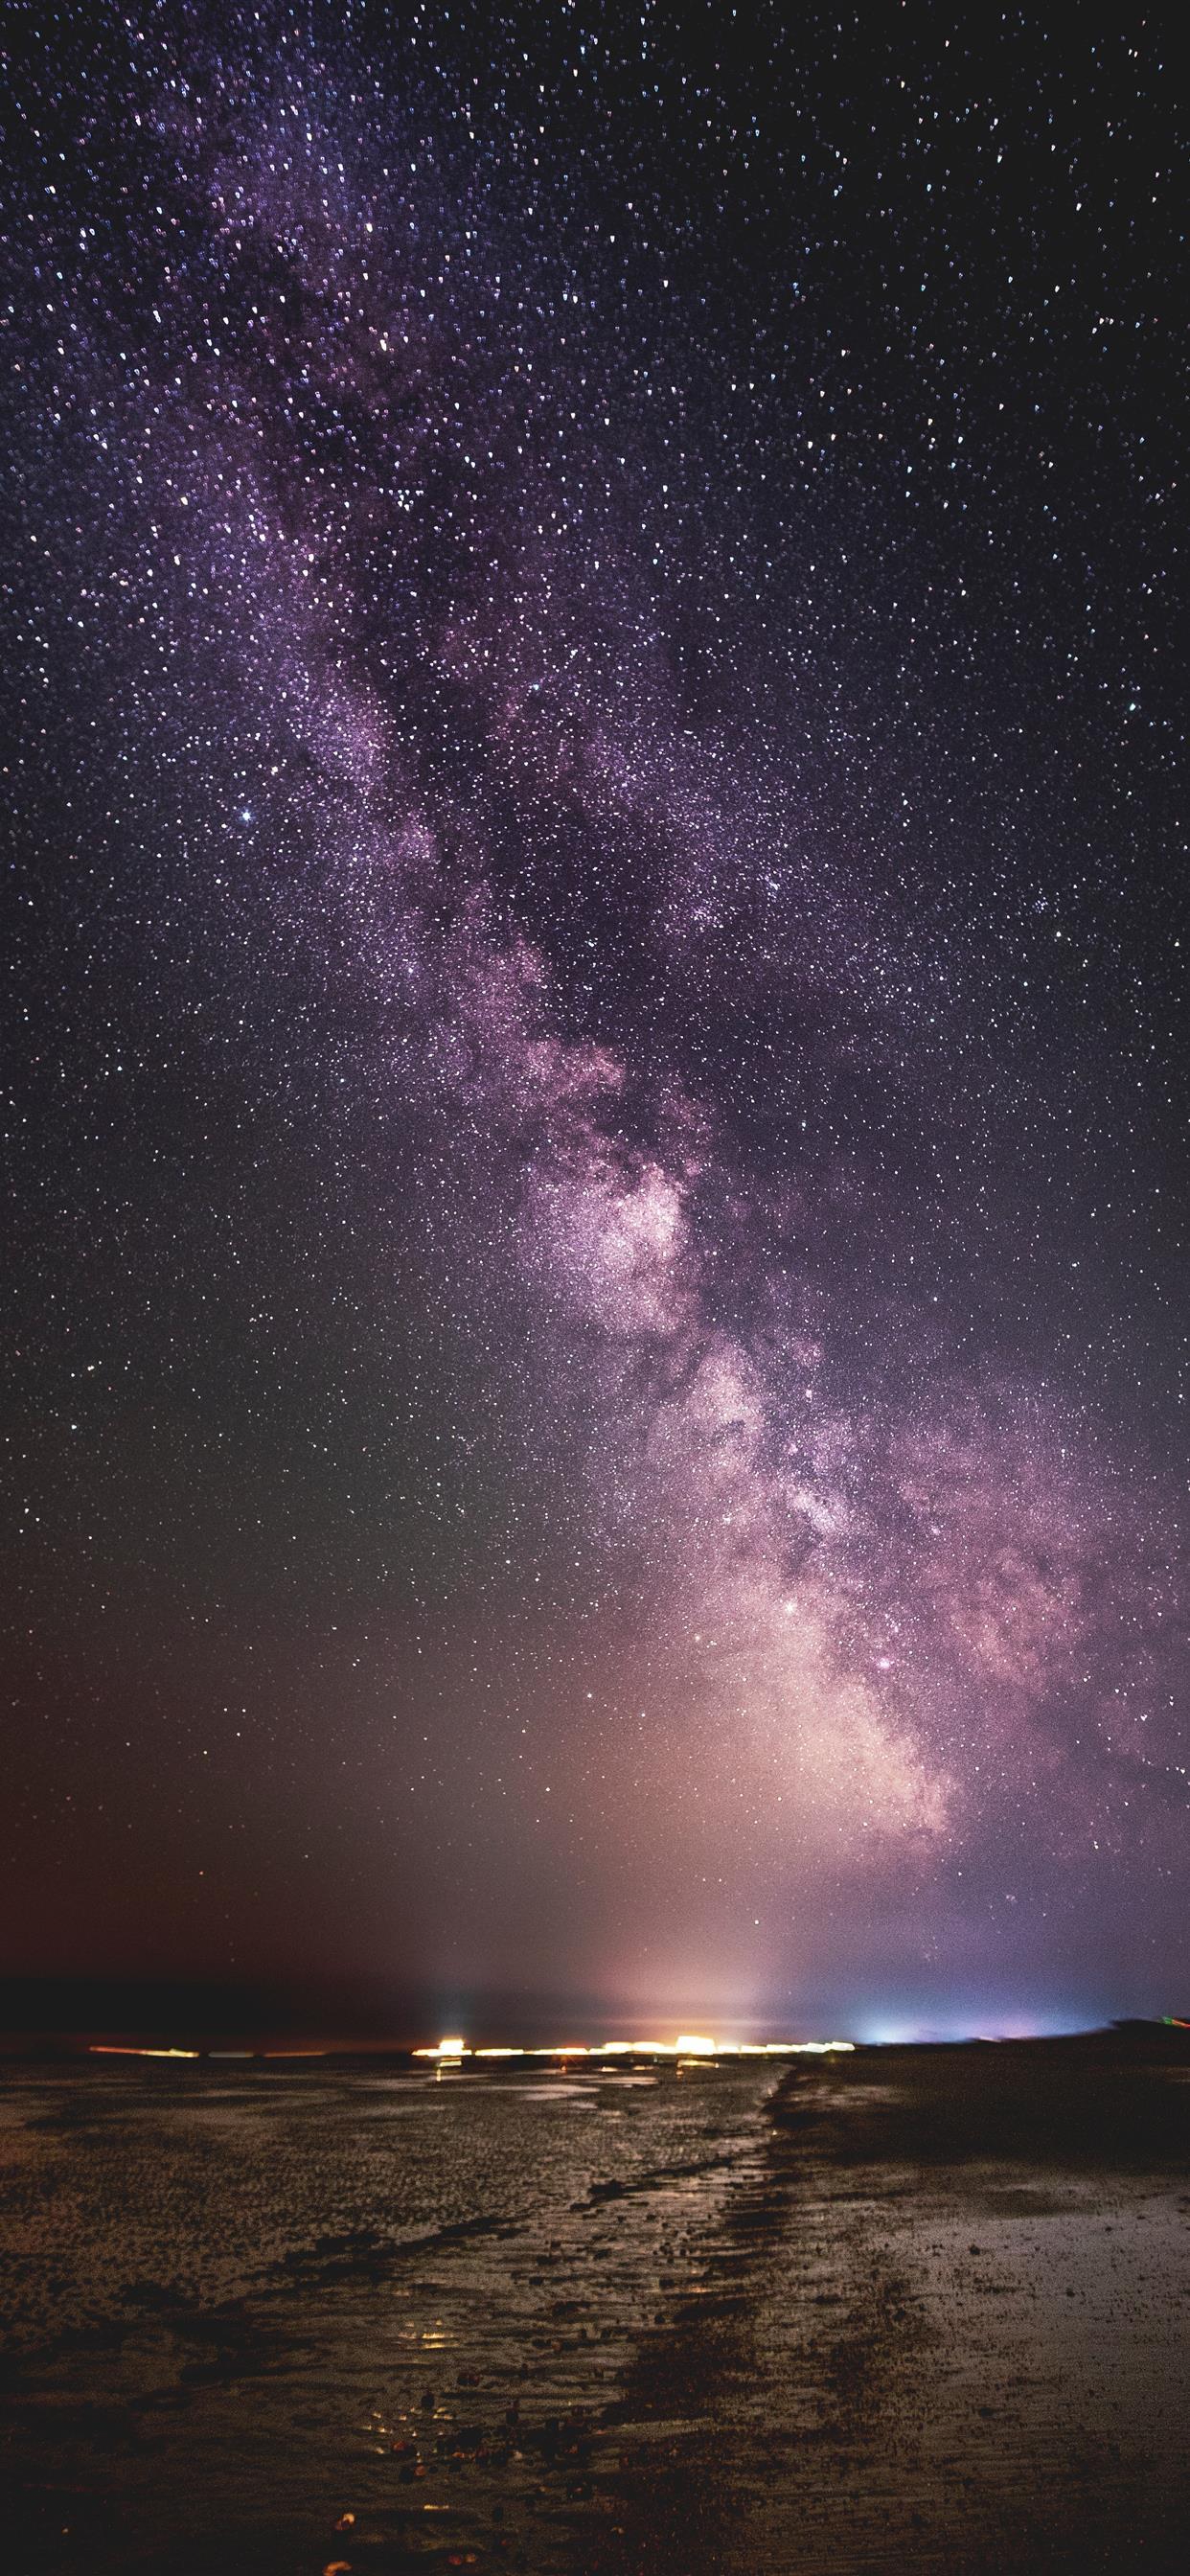 Milky Way iphone 11 pro max wallpaper